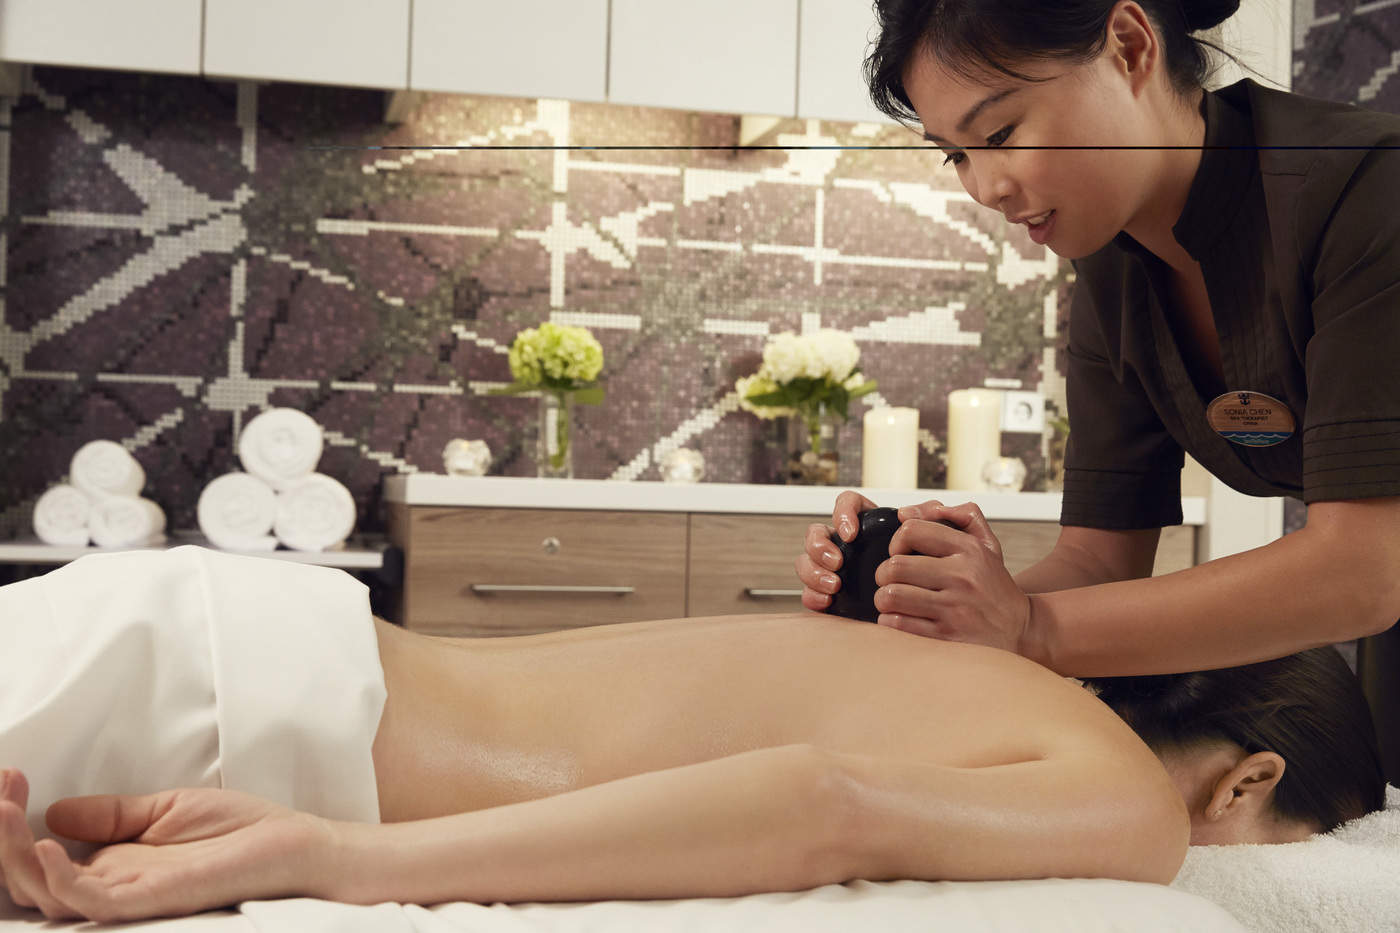 Massage, stone massage at spa, QN class, luxury massage, spa attendant and guest